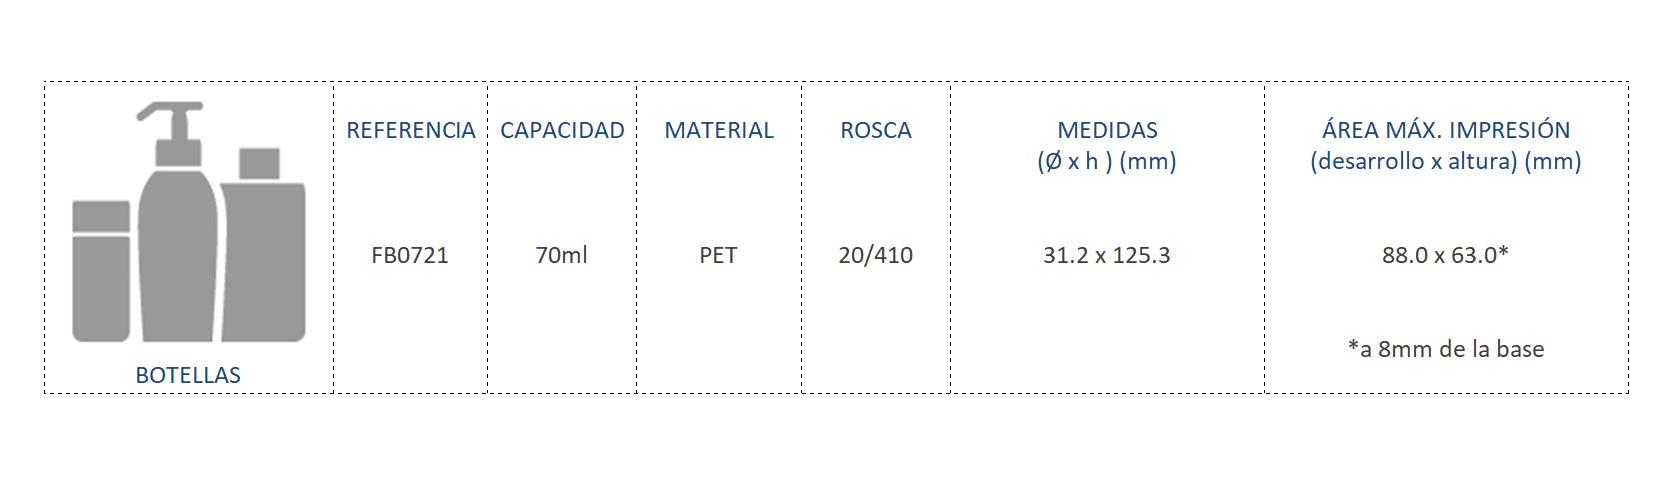 Cuadro de materiales FB0721